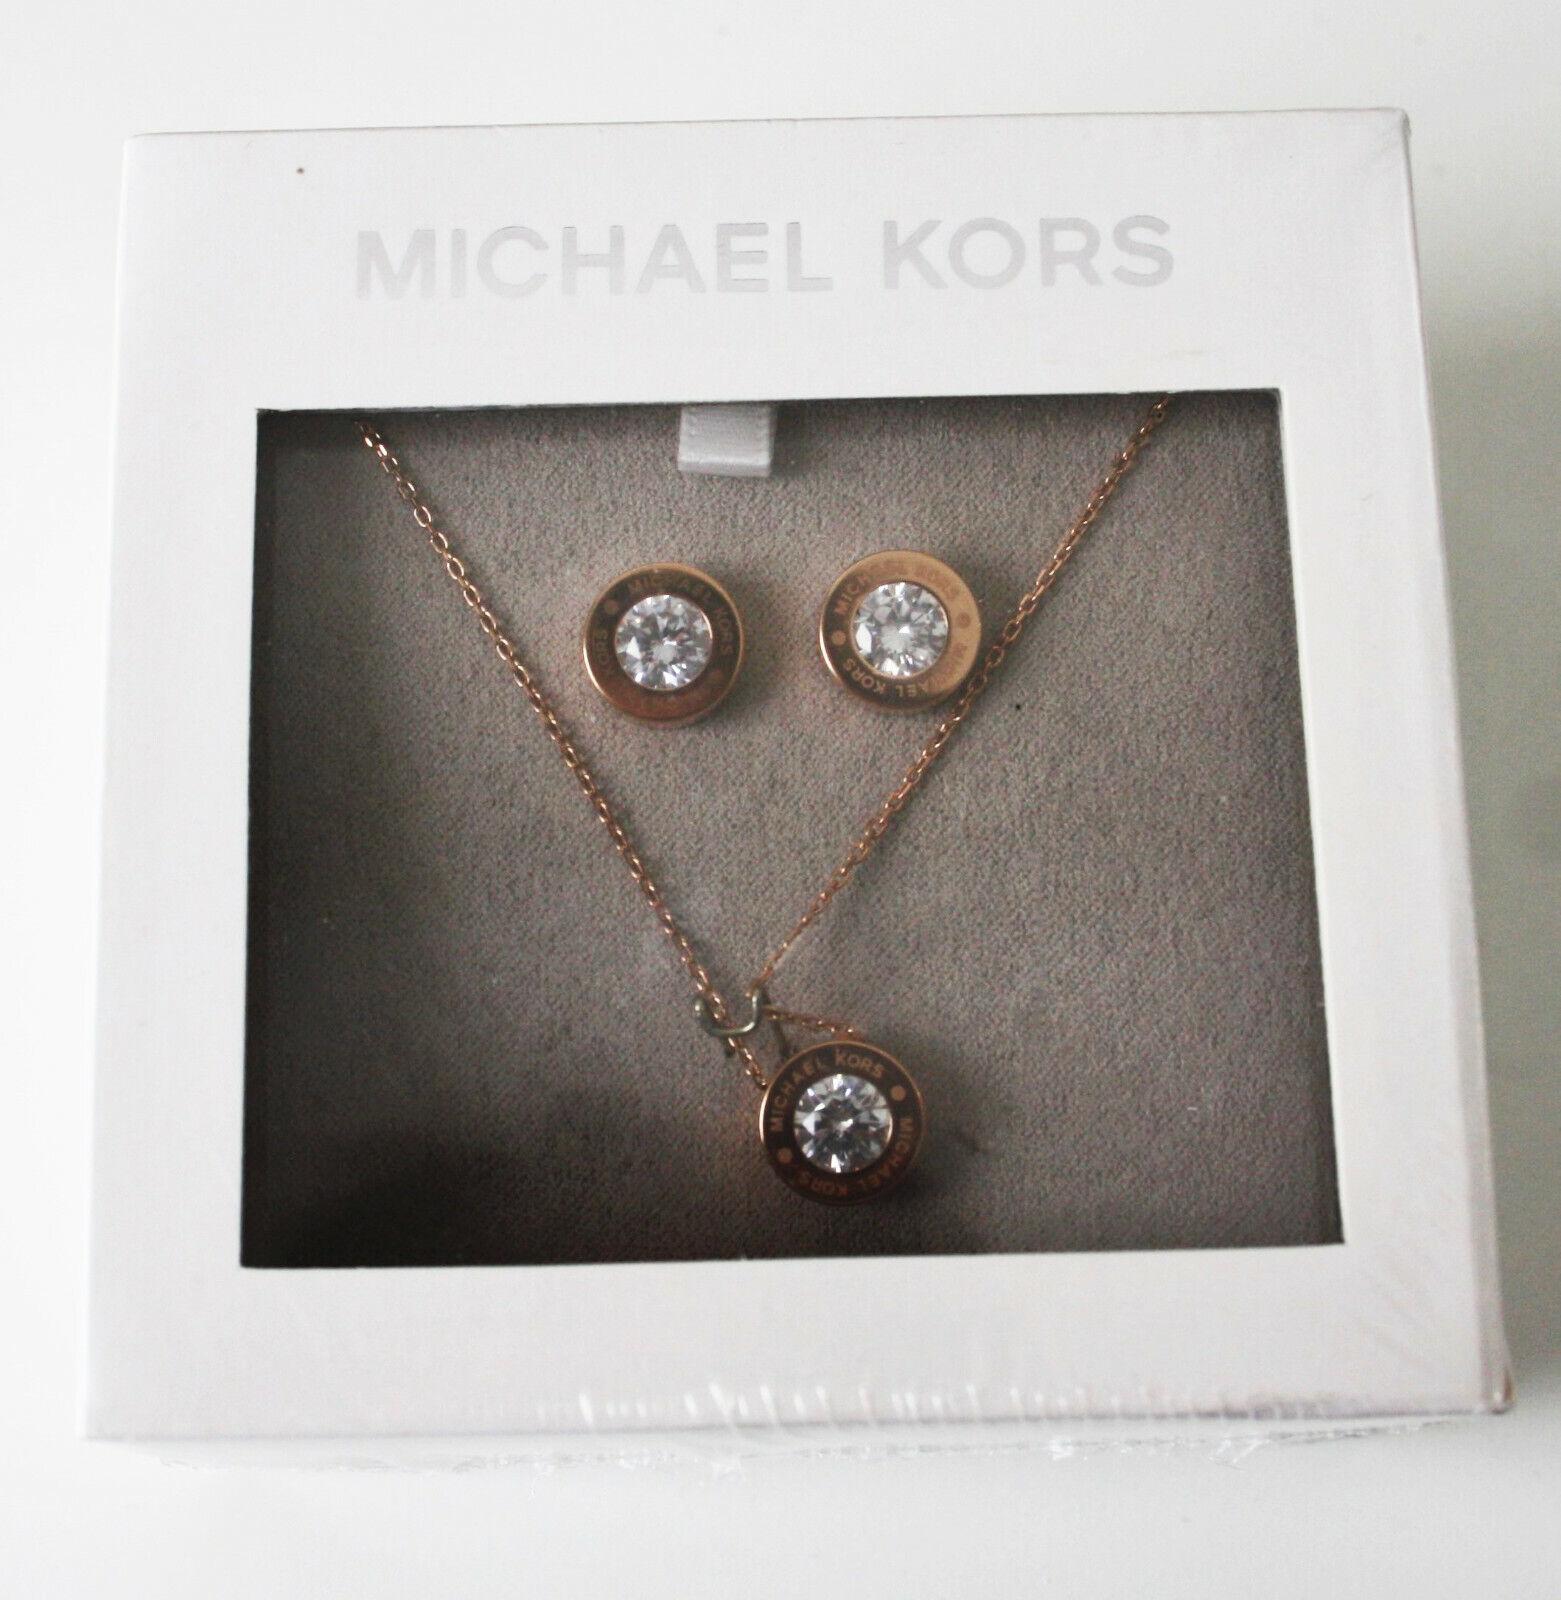 MICHAEL KORS Damen Set Halskette + Ohrstecker MKJ6717791 rosegold